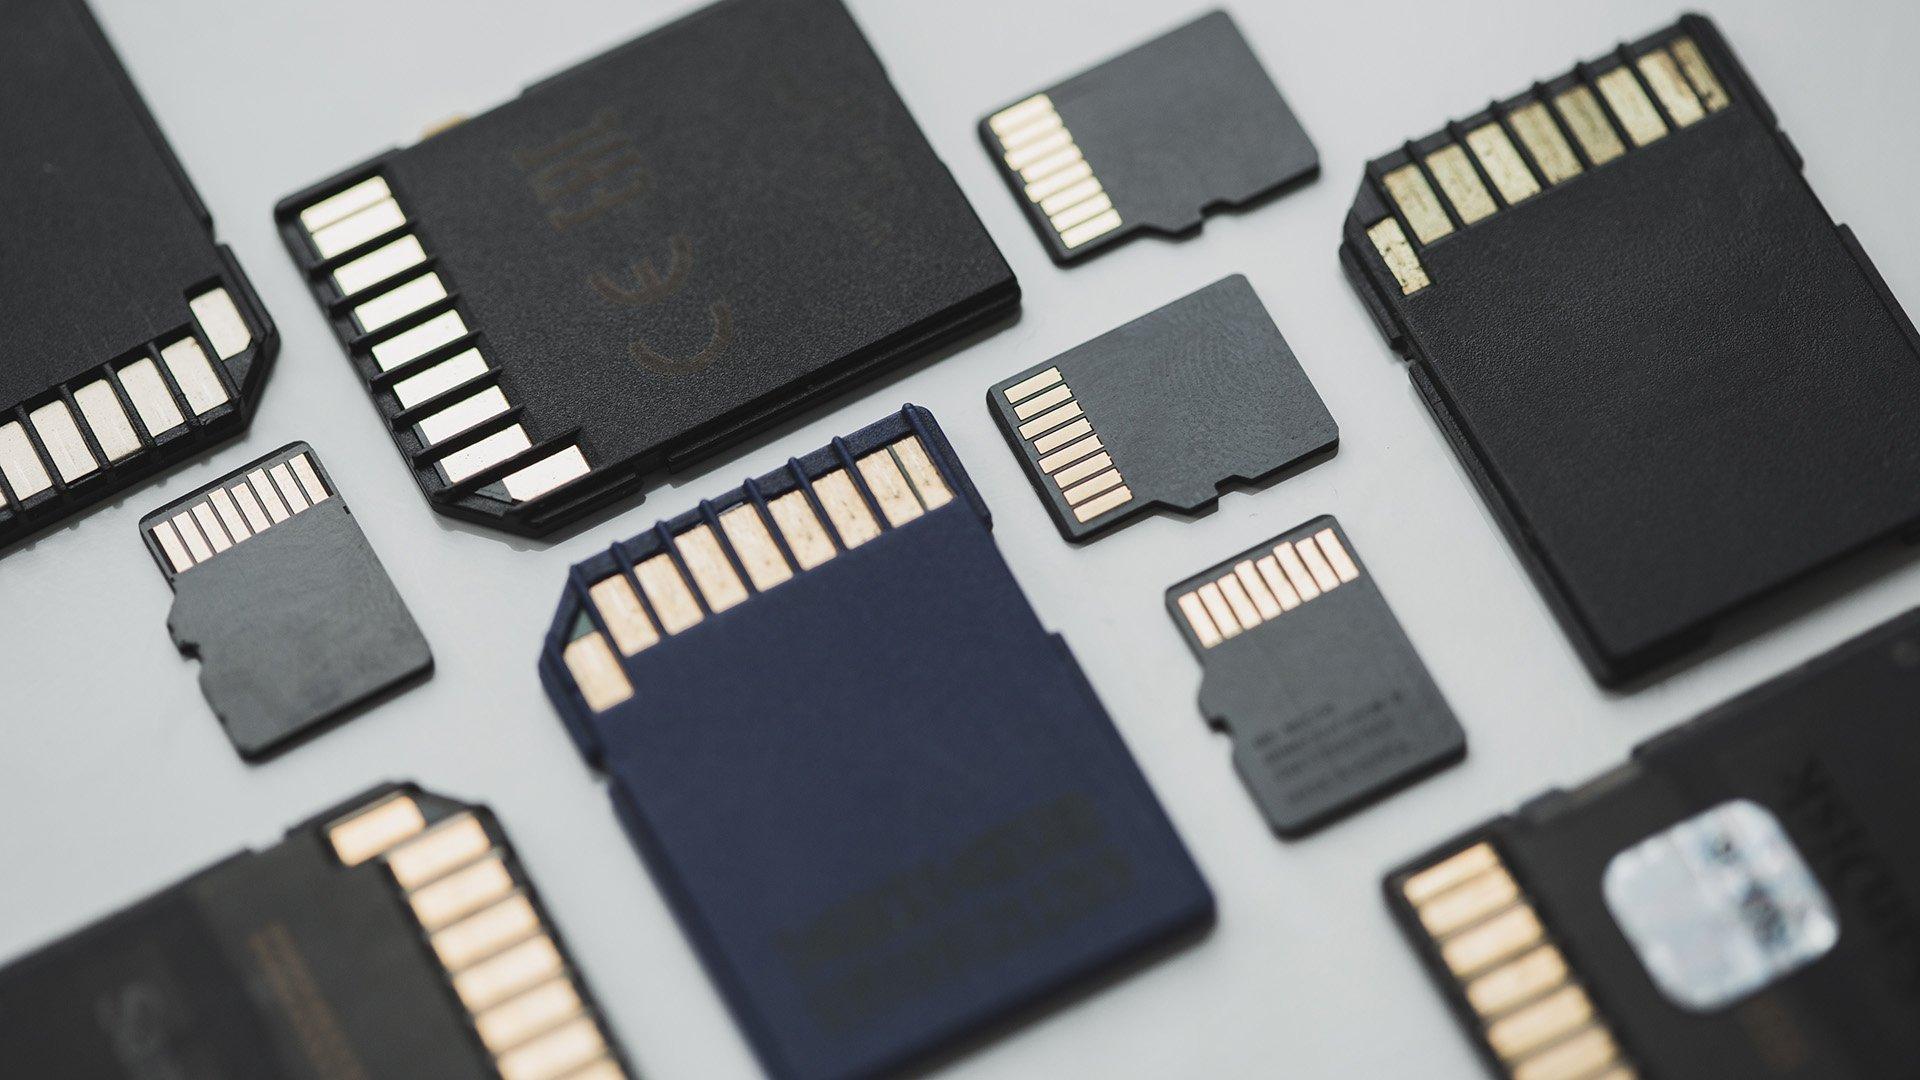 tarjeta de memoria danada android